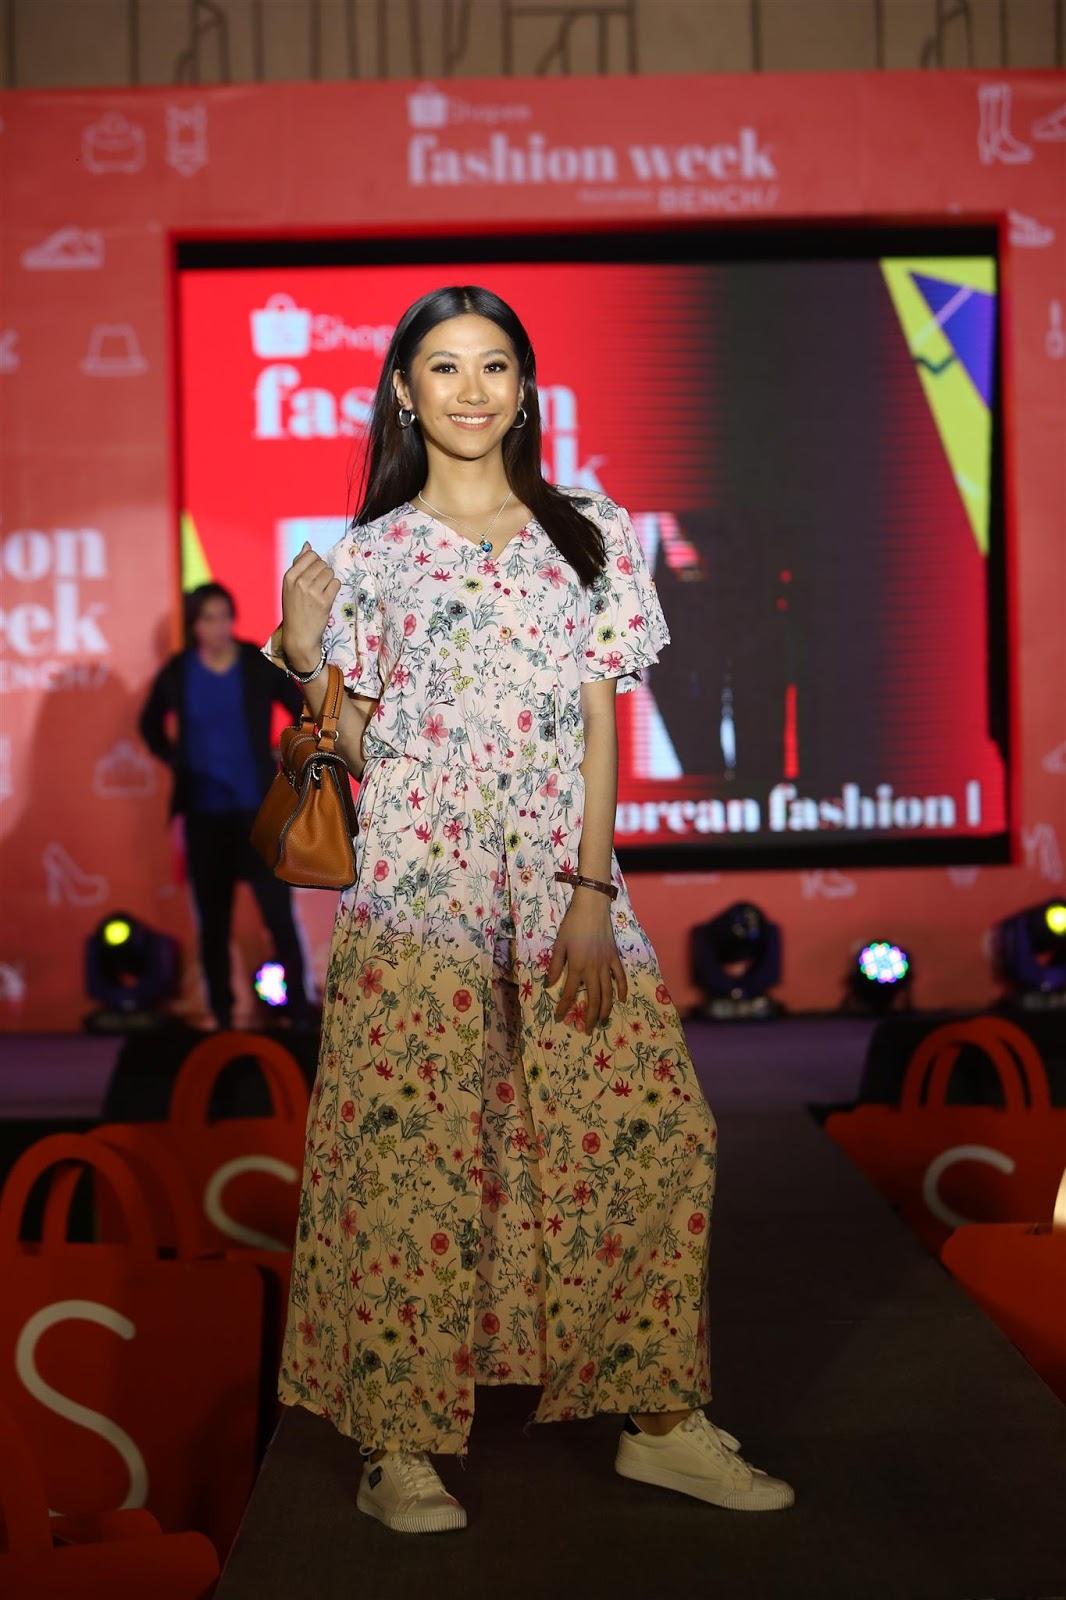 8b6e3ed05e14b Shopee Fashion Week offers Up To 95% Off The Hottest Fashion Items ...